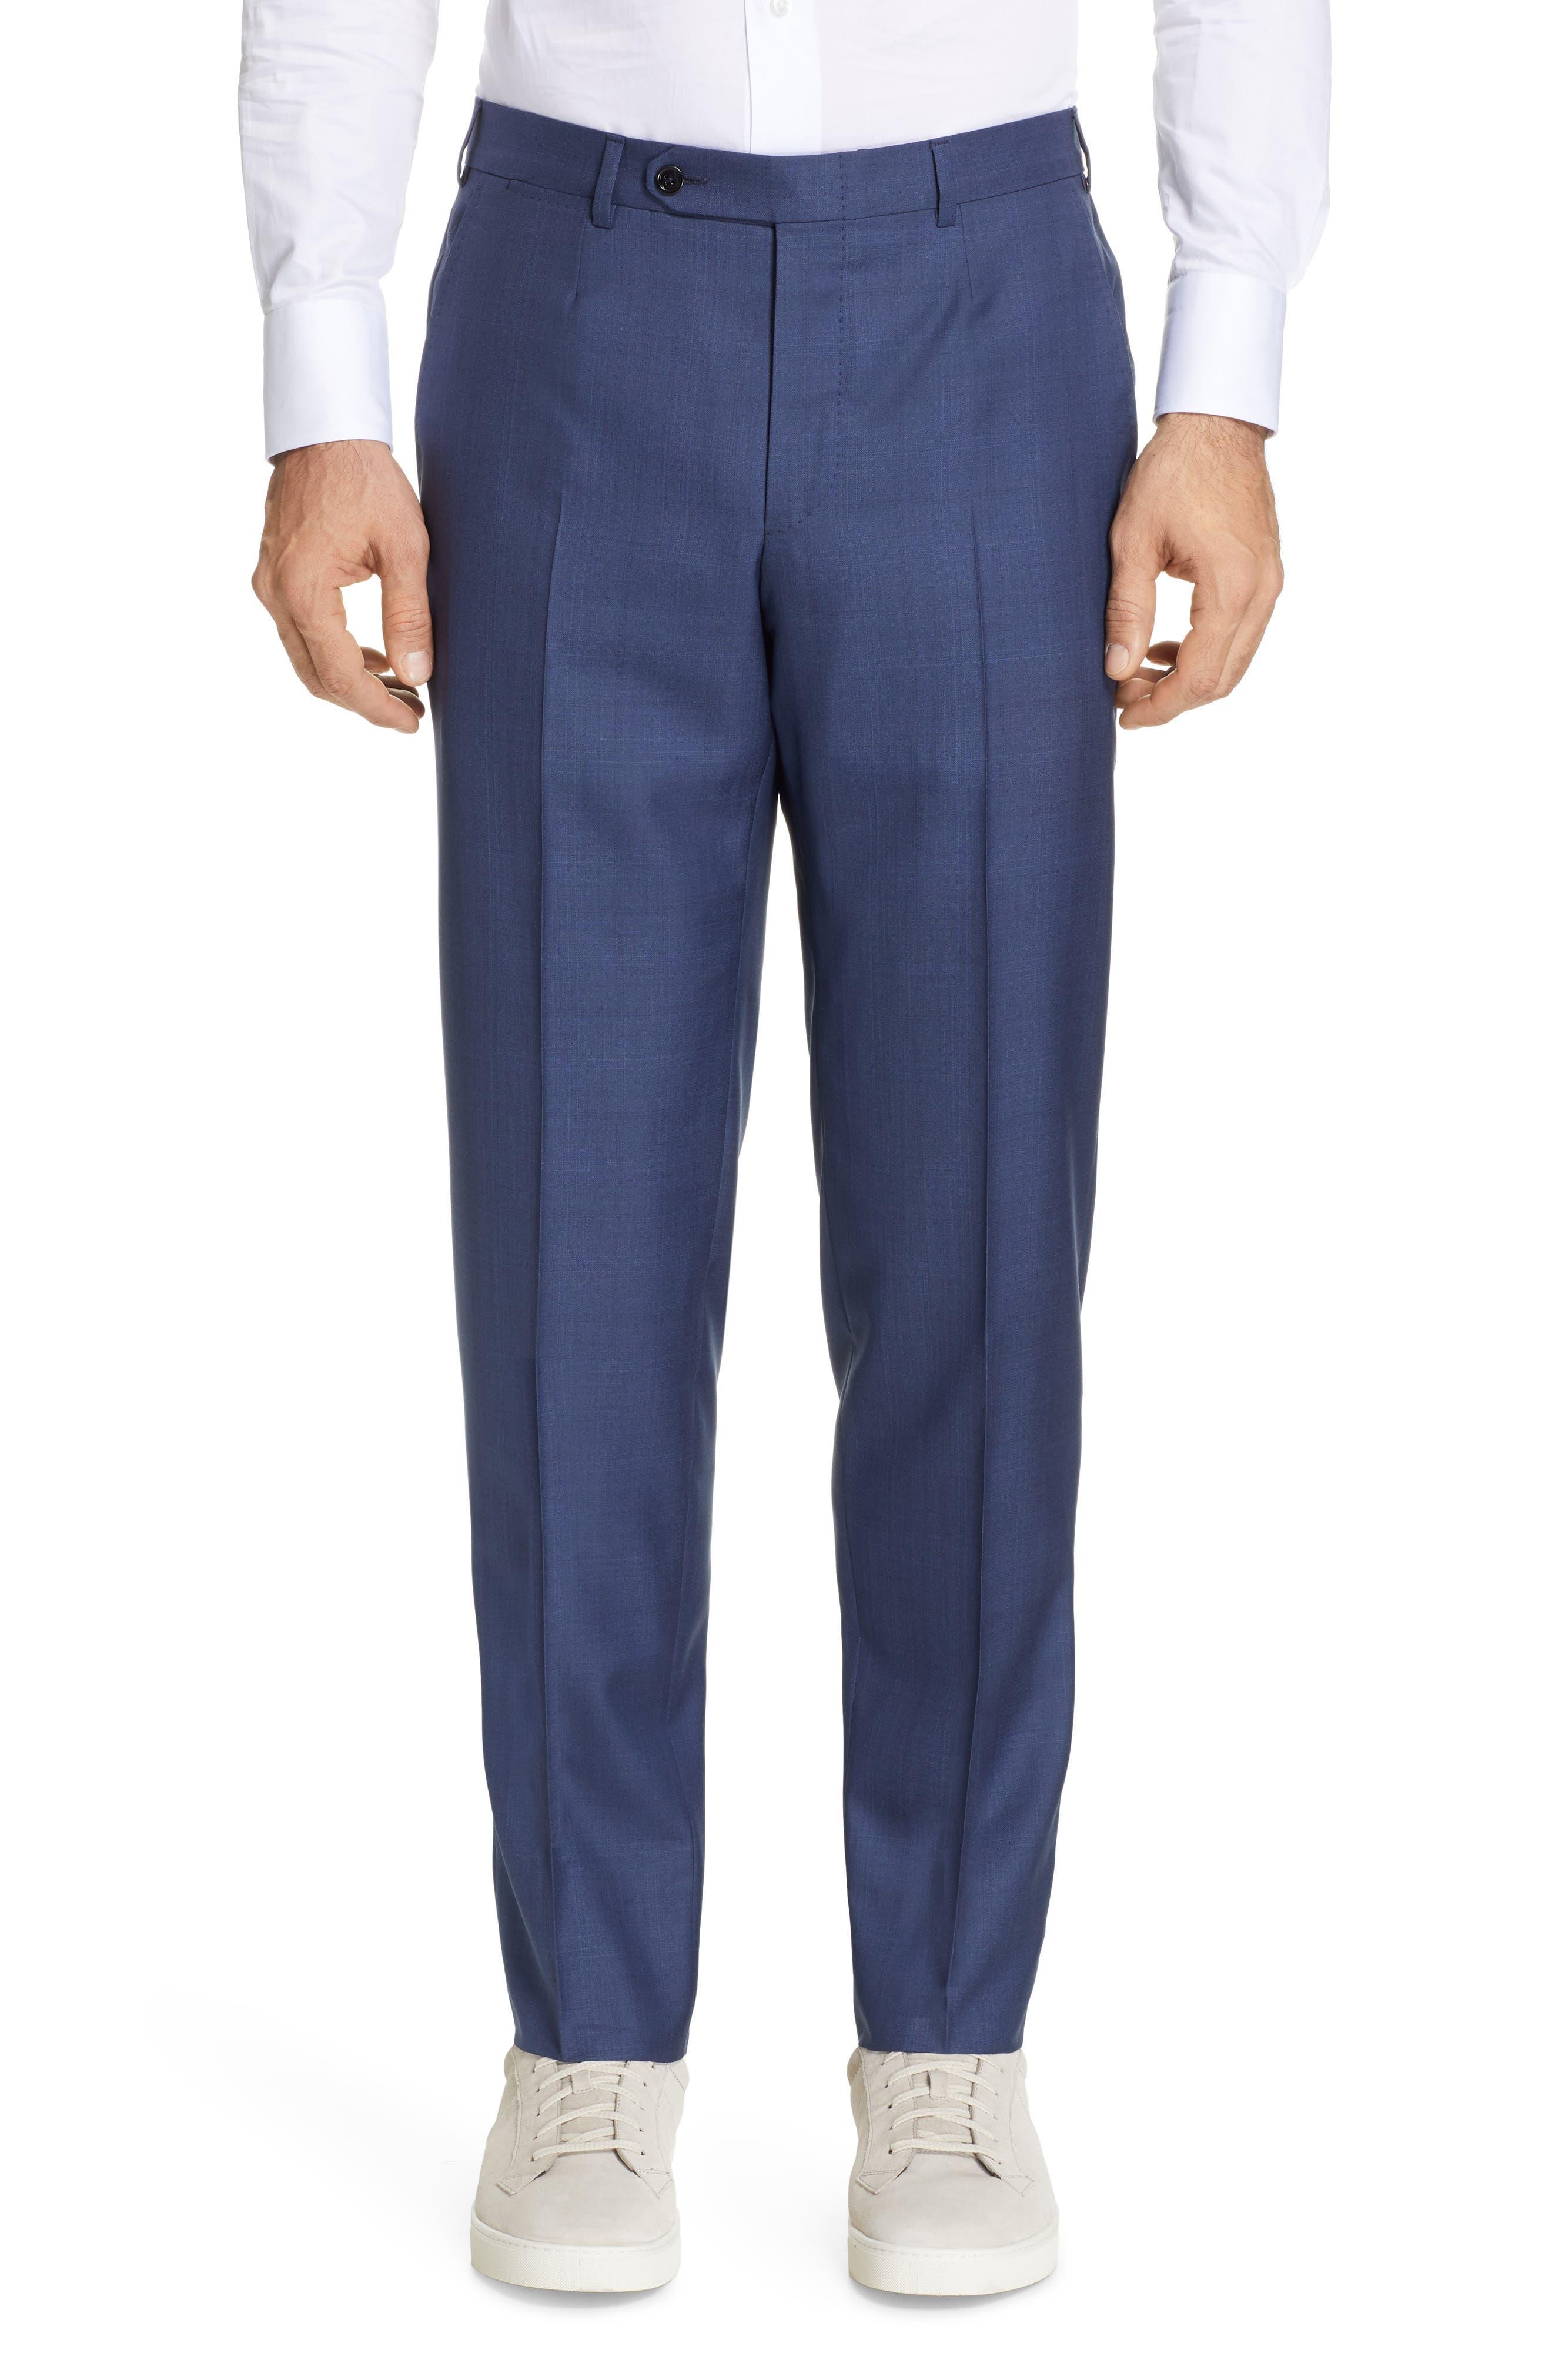 ERMENEGILDO ZEGNA, Trofeo Classic Fit Plaid Wool & Silk Suit, Alternate thumbnail 6, color, BLUE